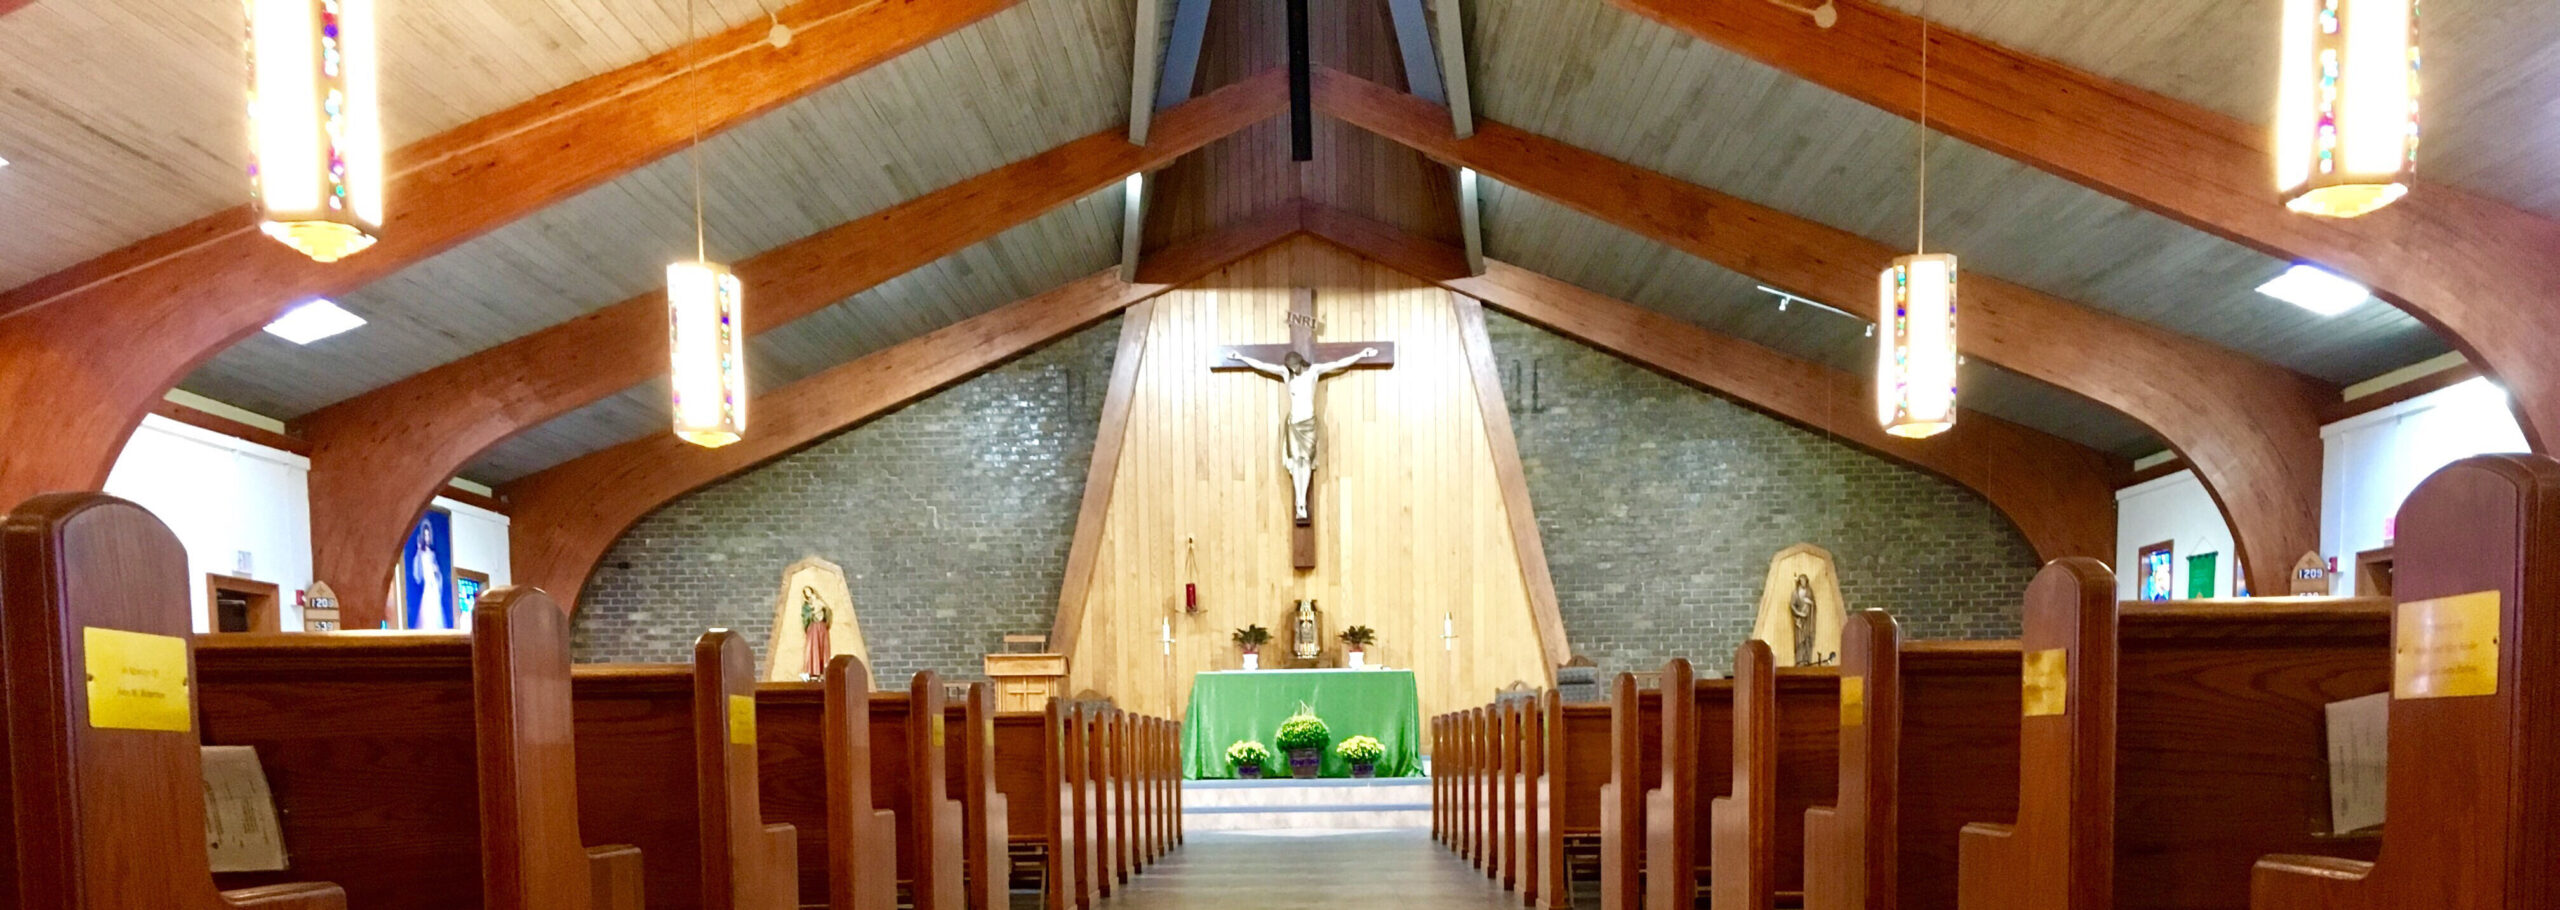 St Thomas Catholic Church